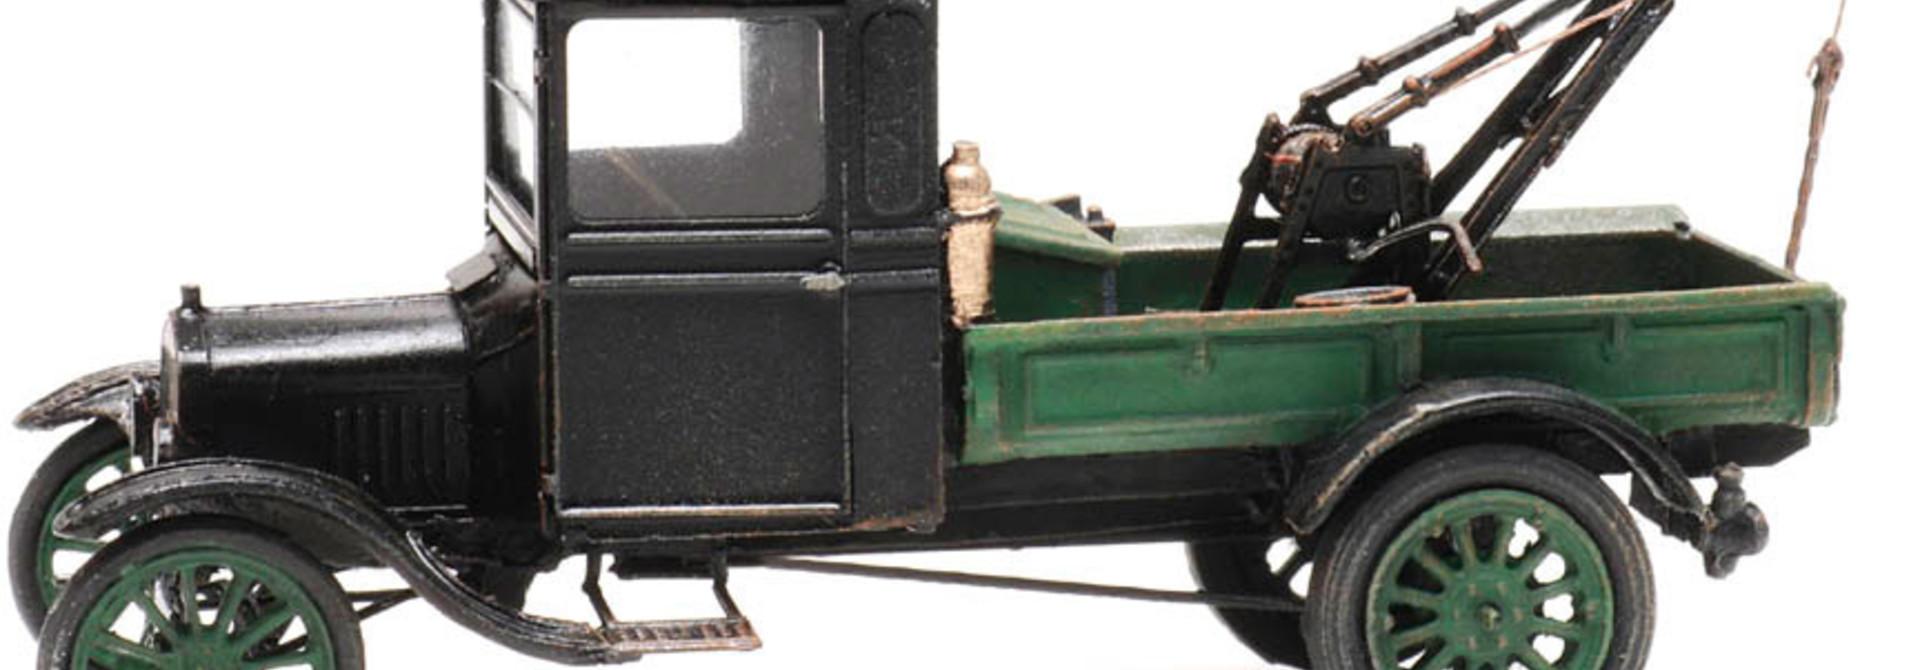 387.419 Ford model TT takelwagen